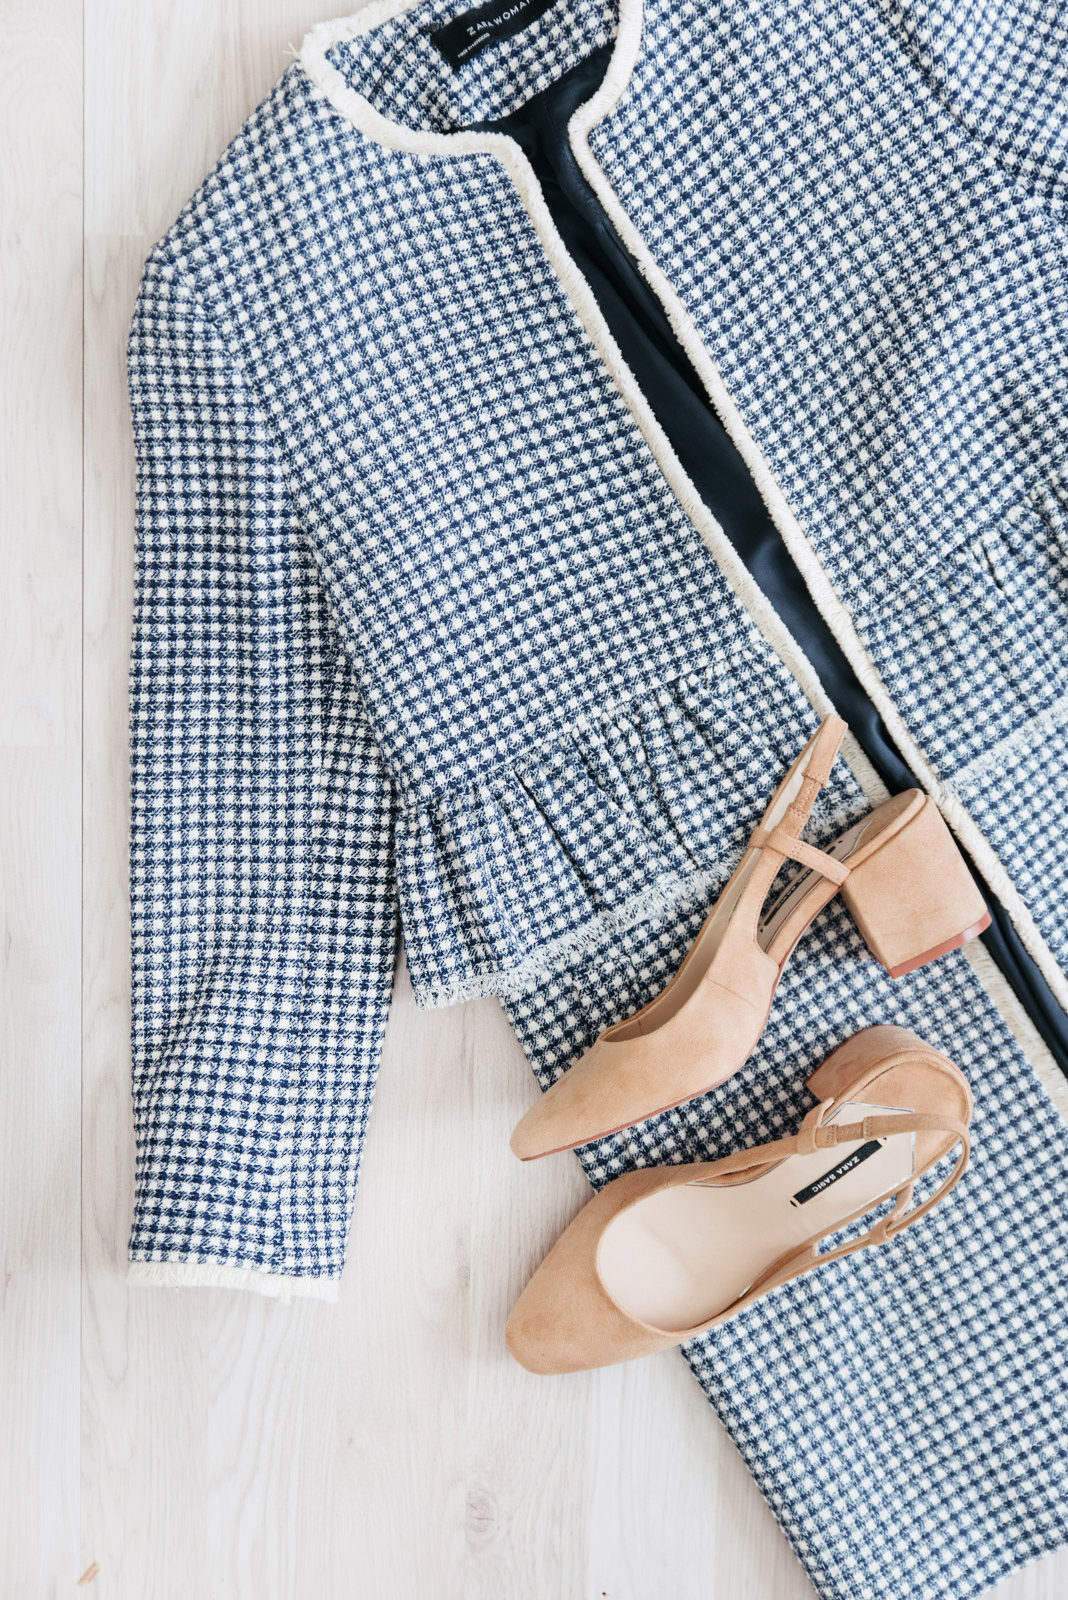 Blog-mode-and-The-City-Lifestyle-Cinq-Petites-Choses-206-achats-zara copie